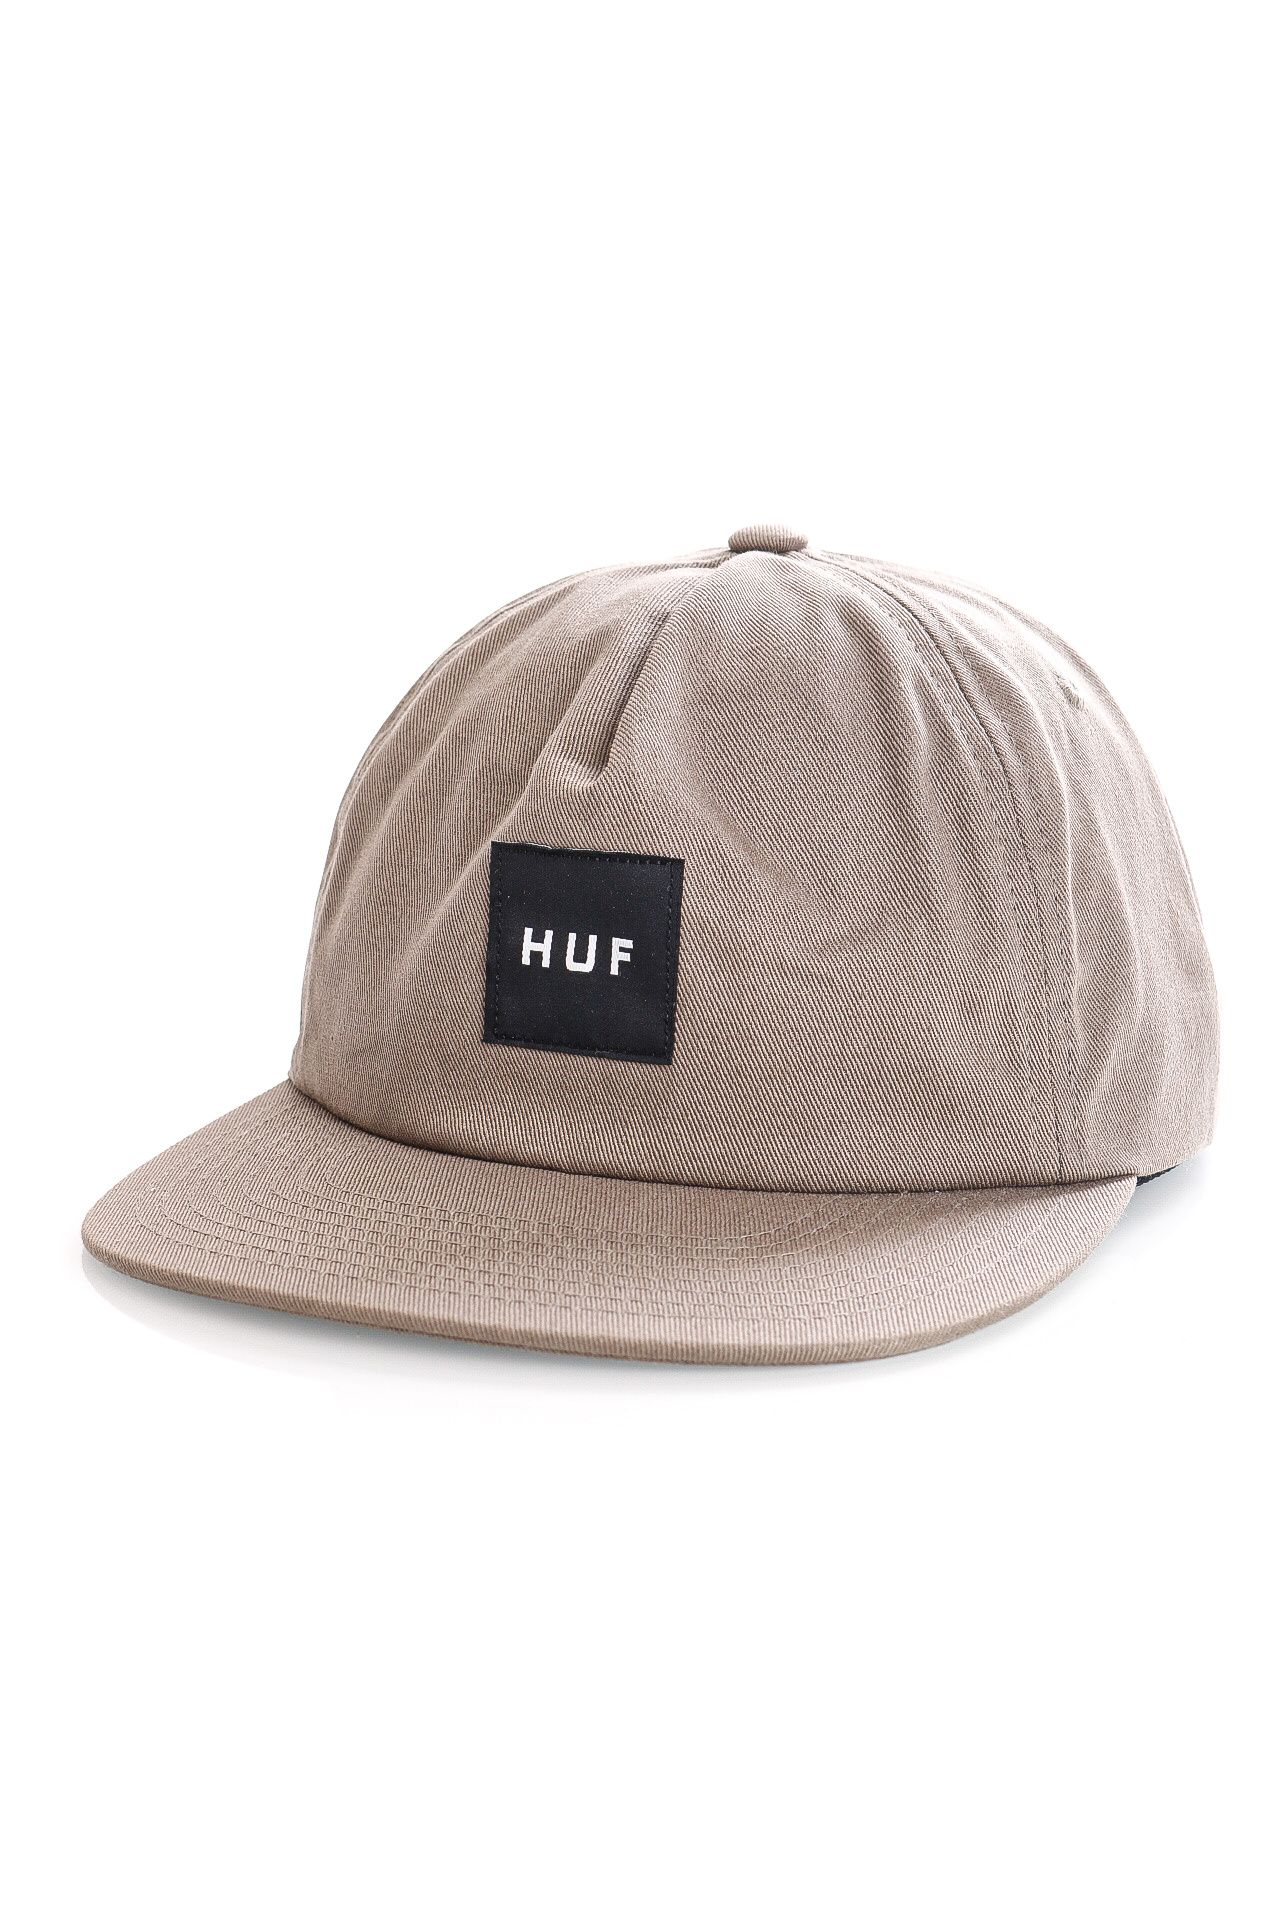 Afbeelding van HUF Snapback HUF ESS UNSTRUCTURED BOX LOGO Brown HT00544